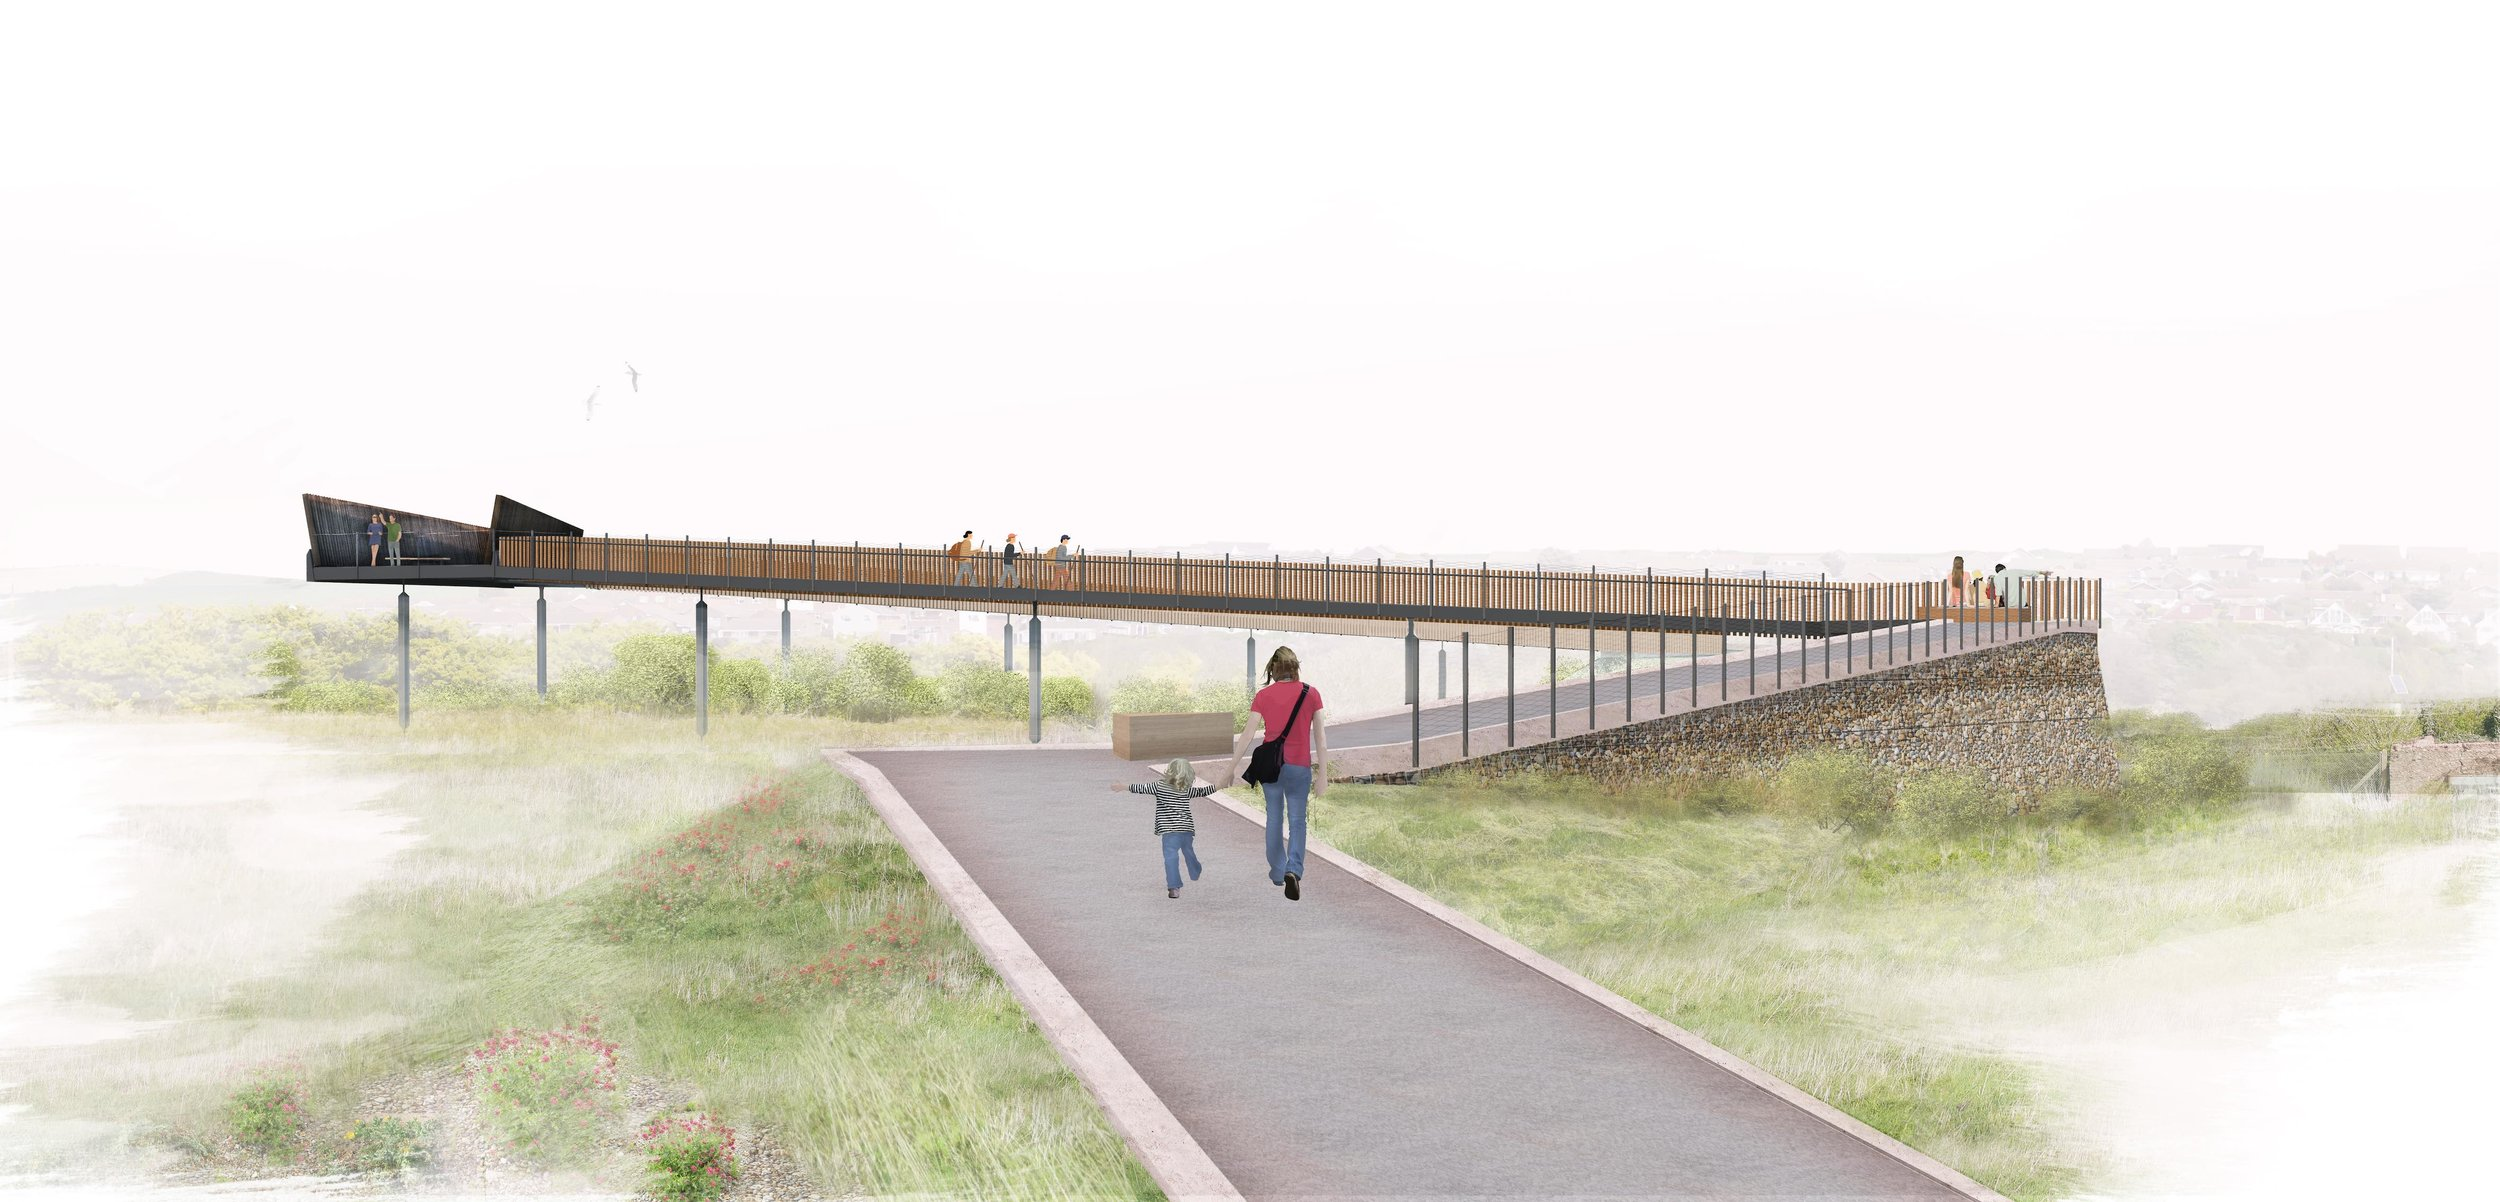 22.07.19 Tide Mills Planning Approval